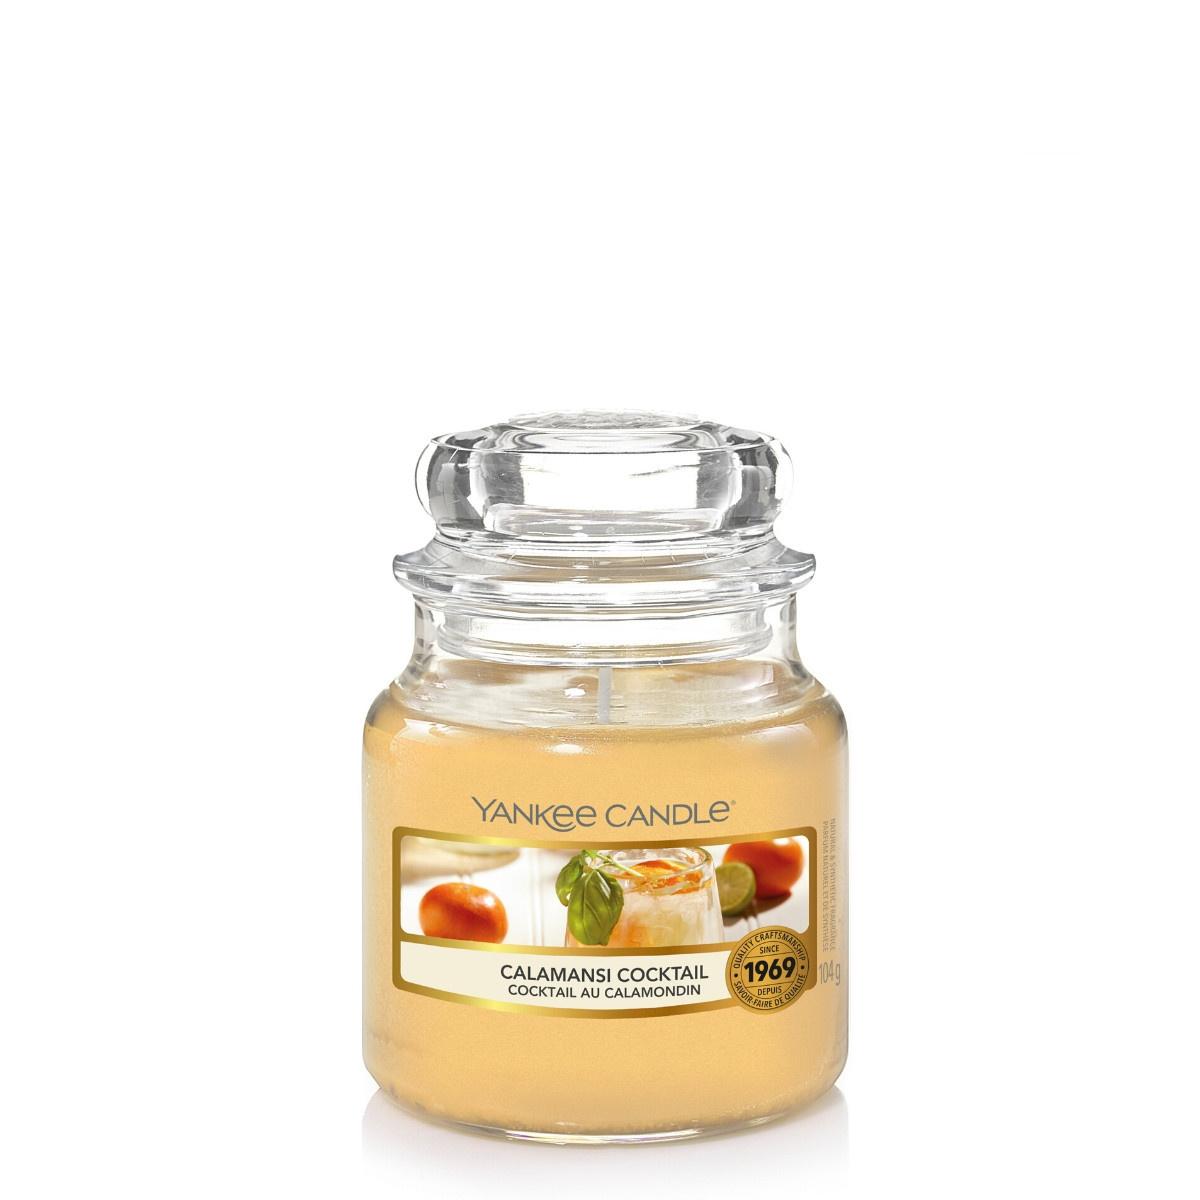 Yankee Candle Calamansi Cocktail - Small Jar